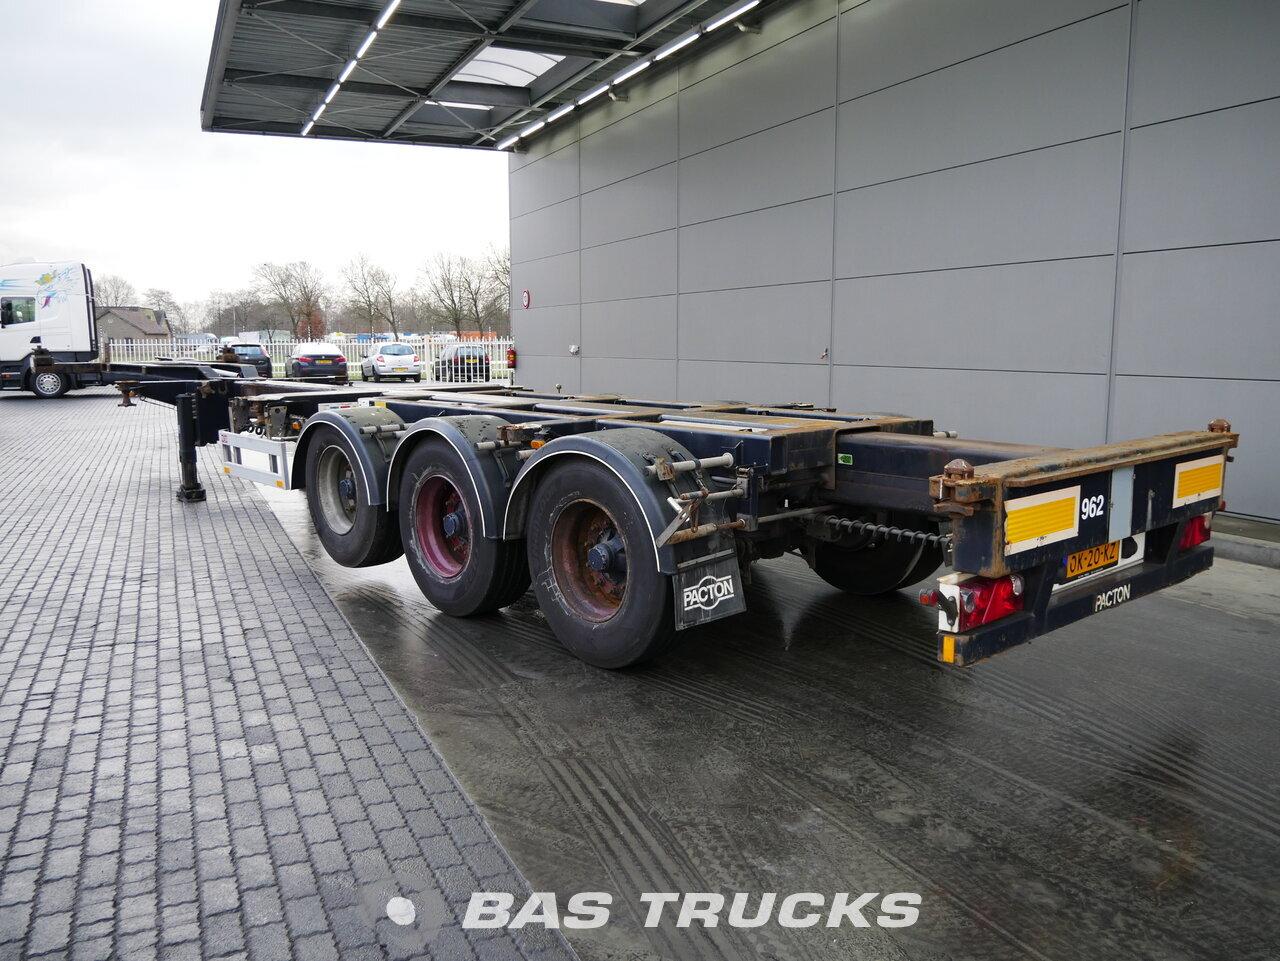 foto di Usato Semirimorchio Pacton T3-010 Liftachse 2x Ausziehbar Extending-Multifunctional-Chassis assi 2008